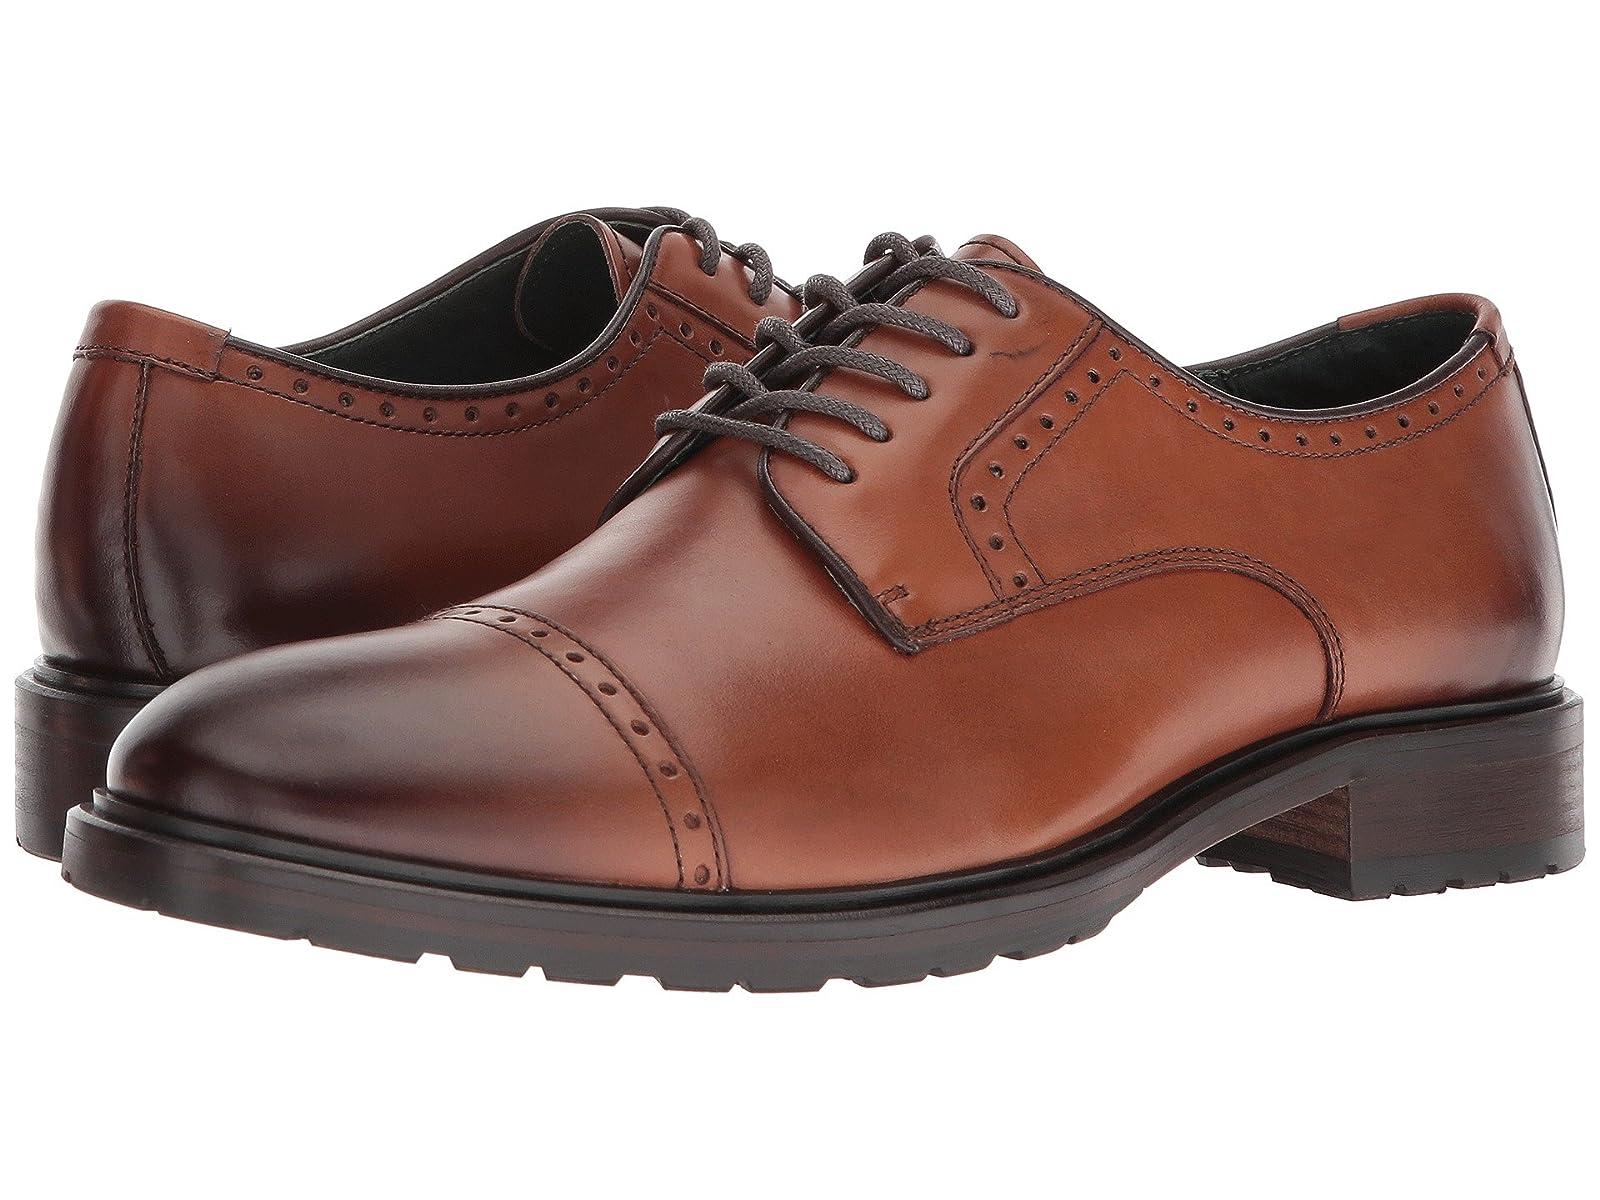 Johnston & Murphy Myles Cap ToeCheap and distinctive eye-catching shoes